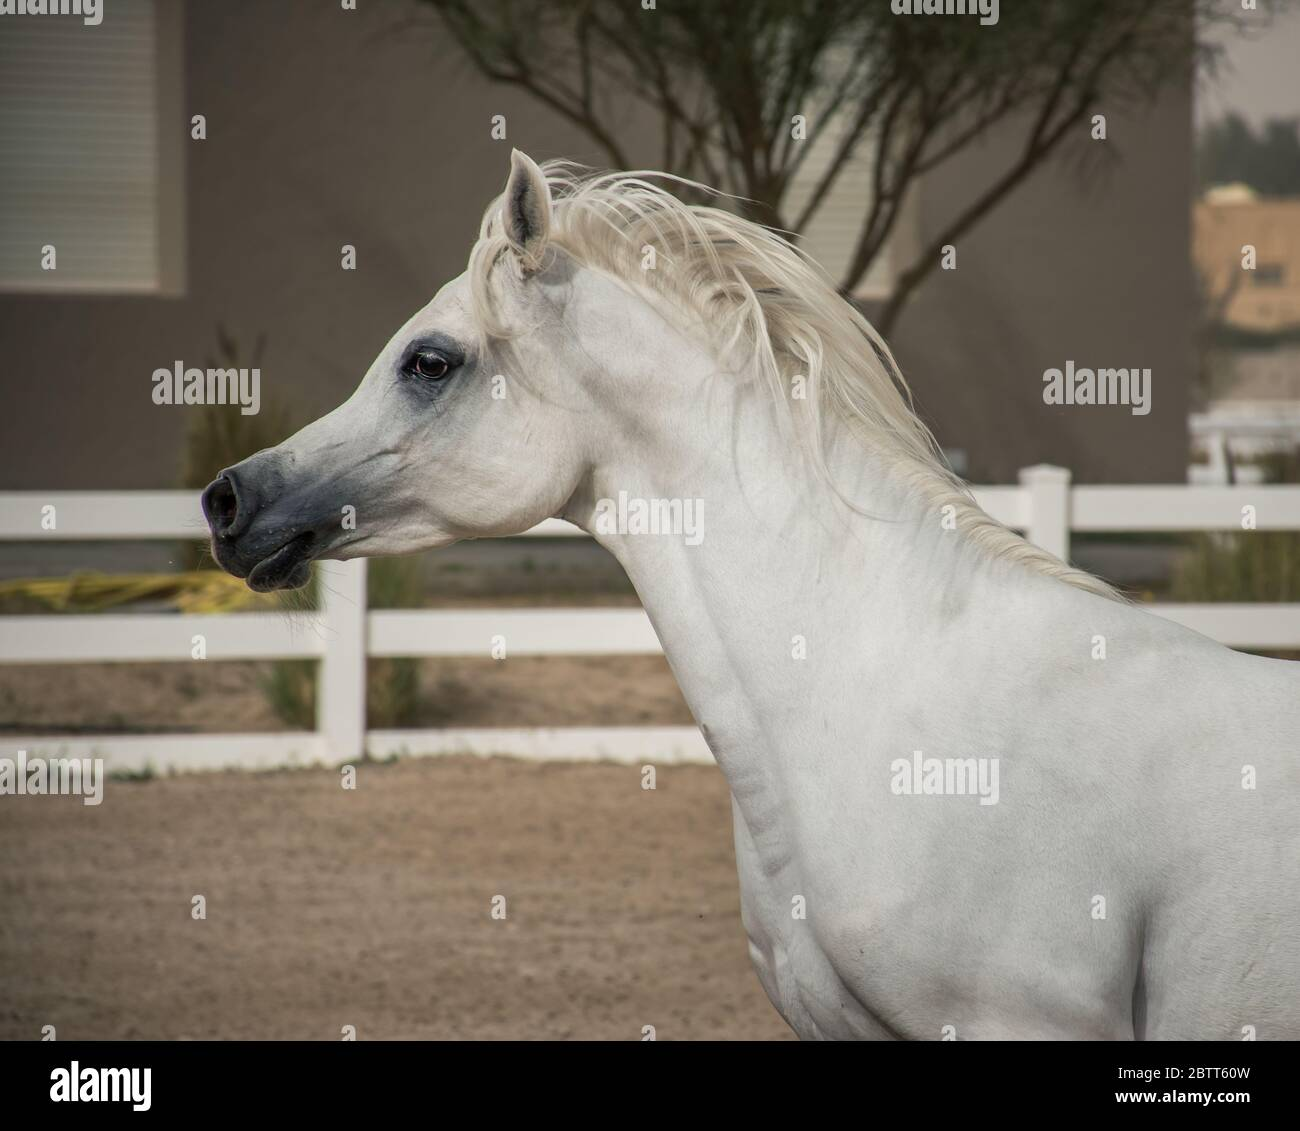 White Arabian Horse Side Face Portrait While Running Inside The Paddock Of Bait Al Arab Kuwait Stock Photo Alamy